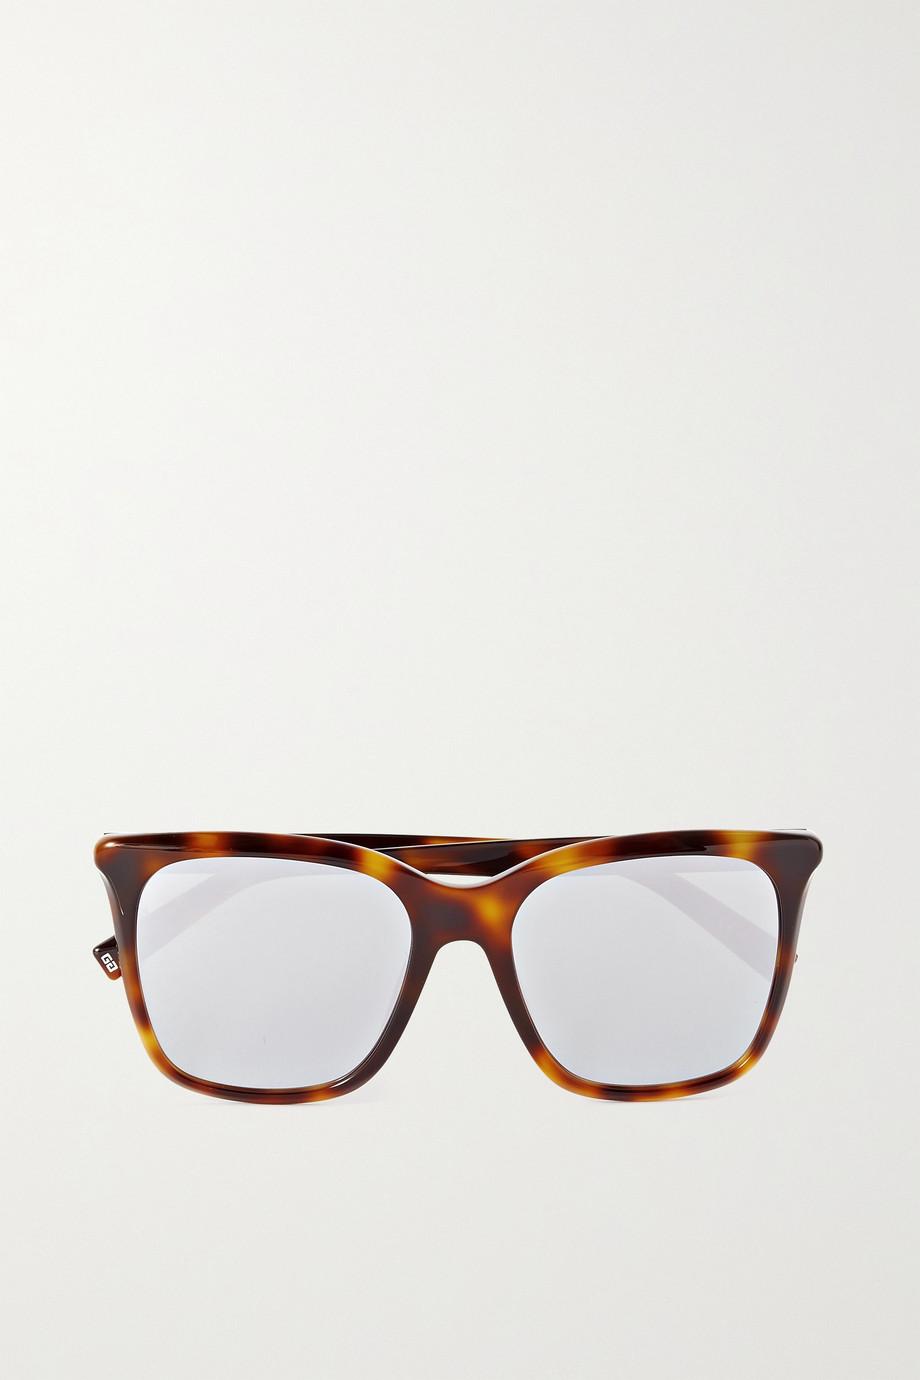 Givenchy D-frame tortoiseshell acetate mirrored sunglasses